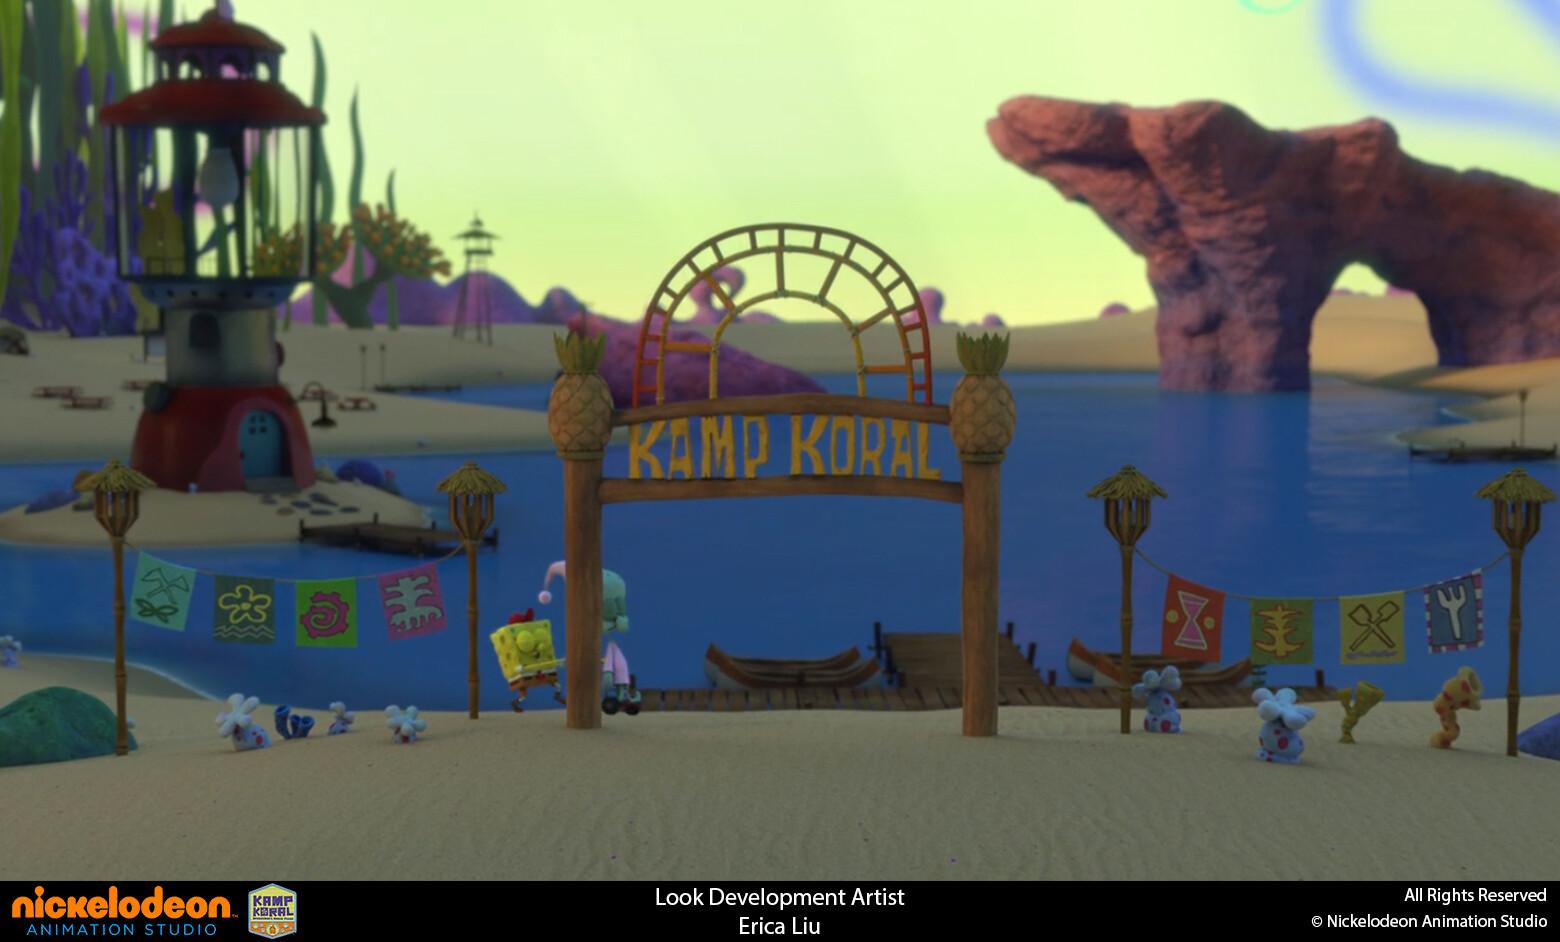 Textured gateway to Kamp